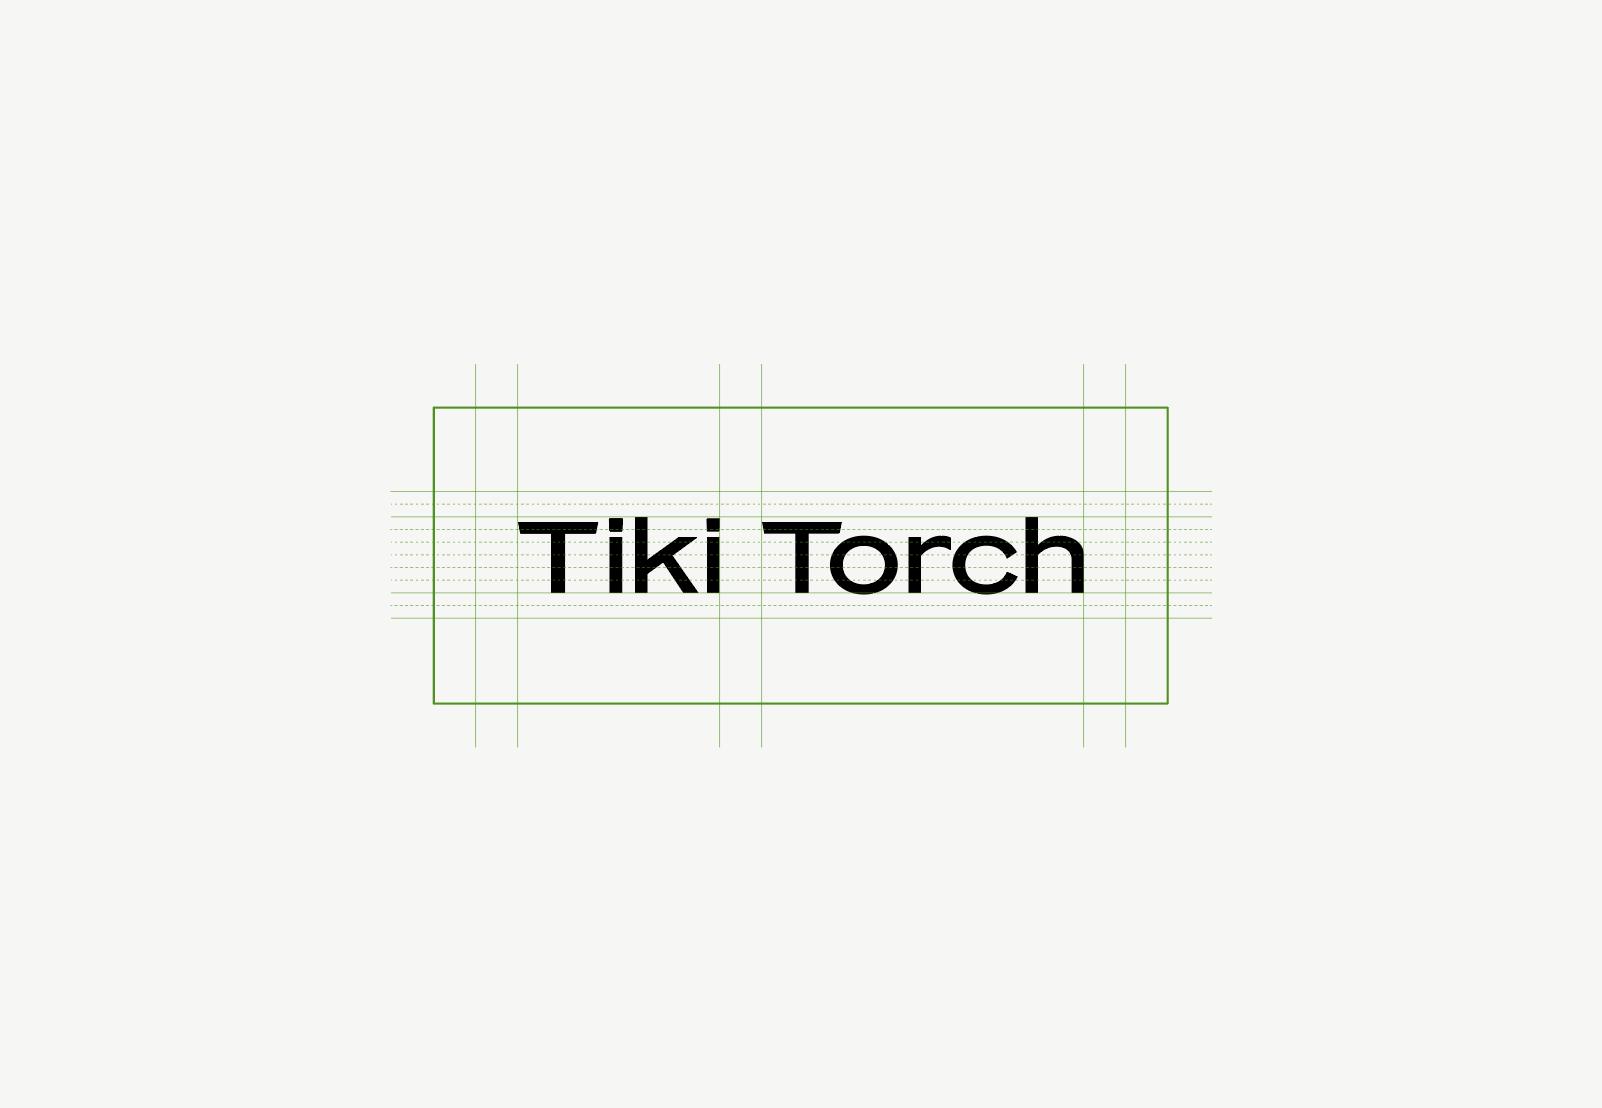 tikitorch-weed-logo4